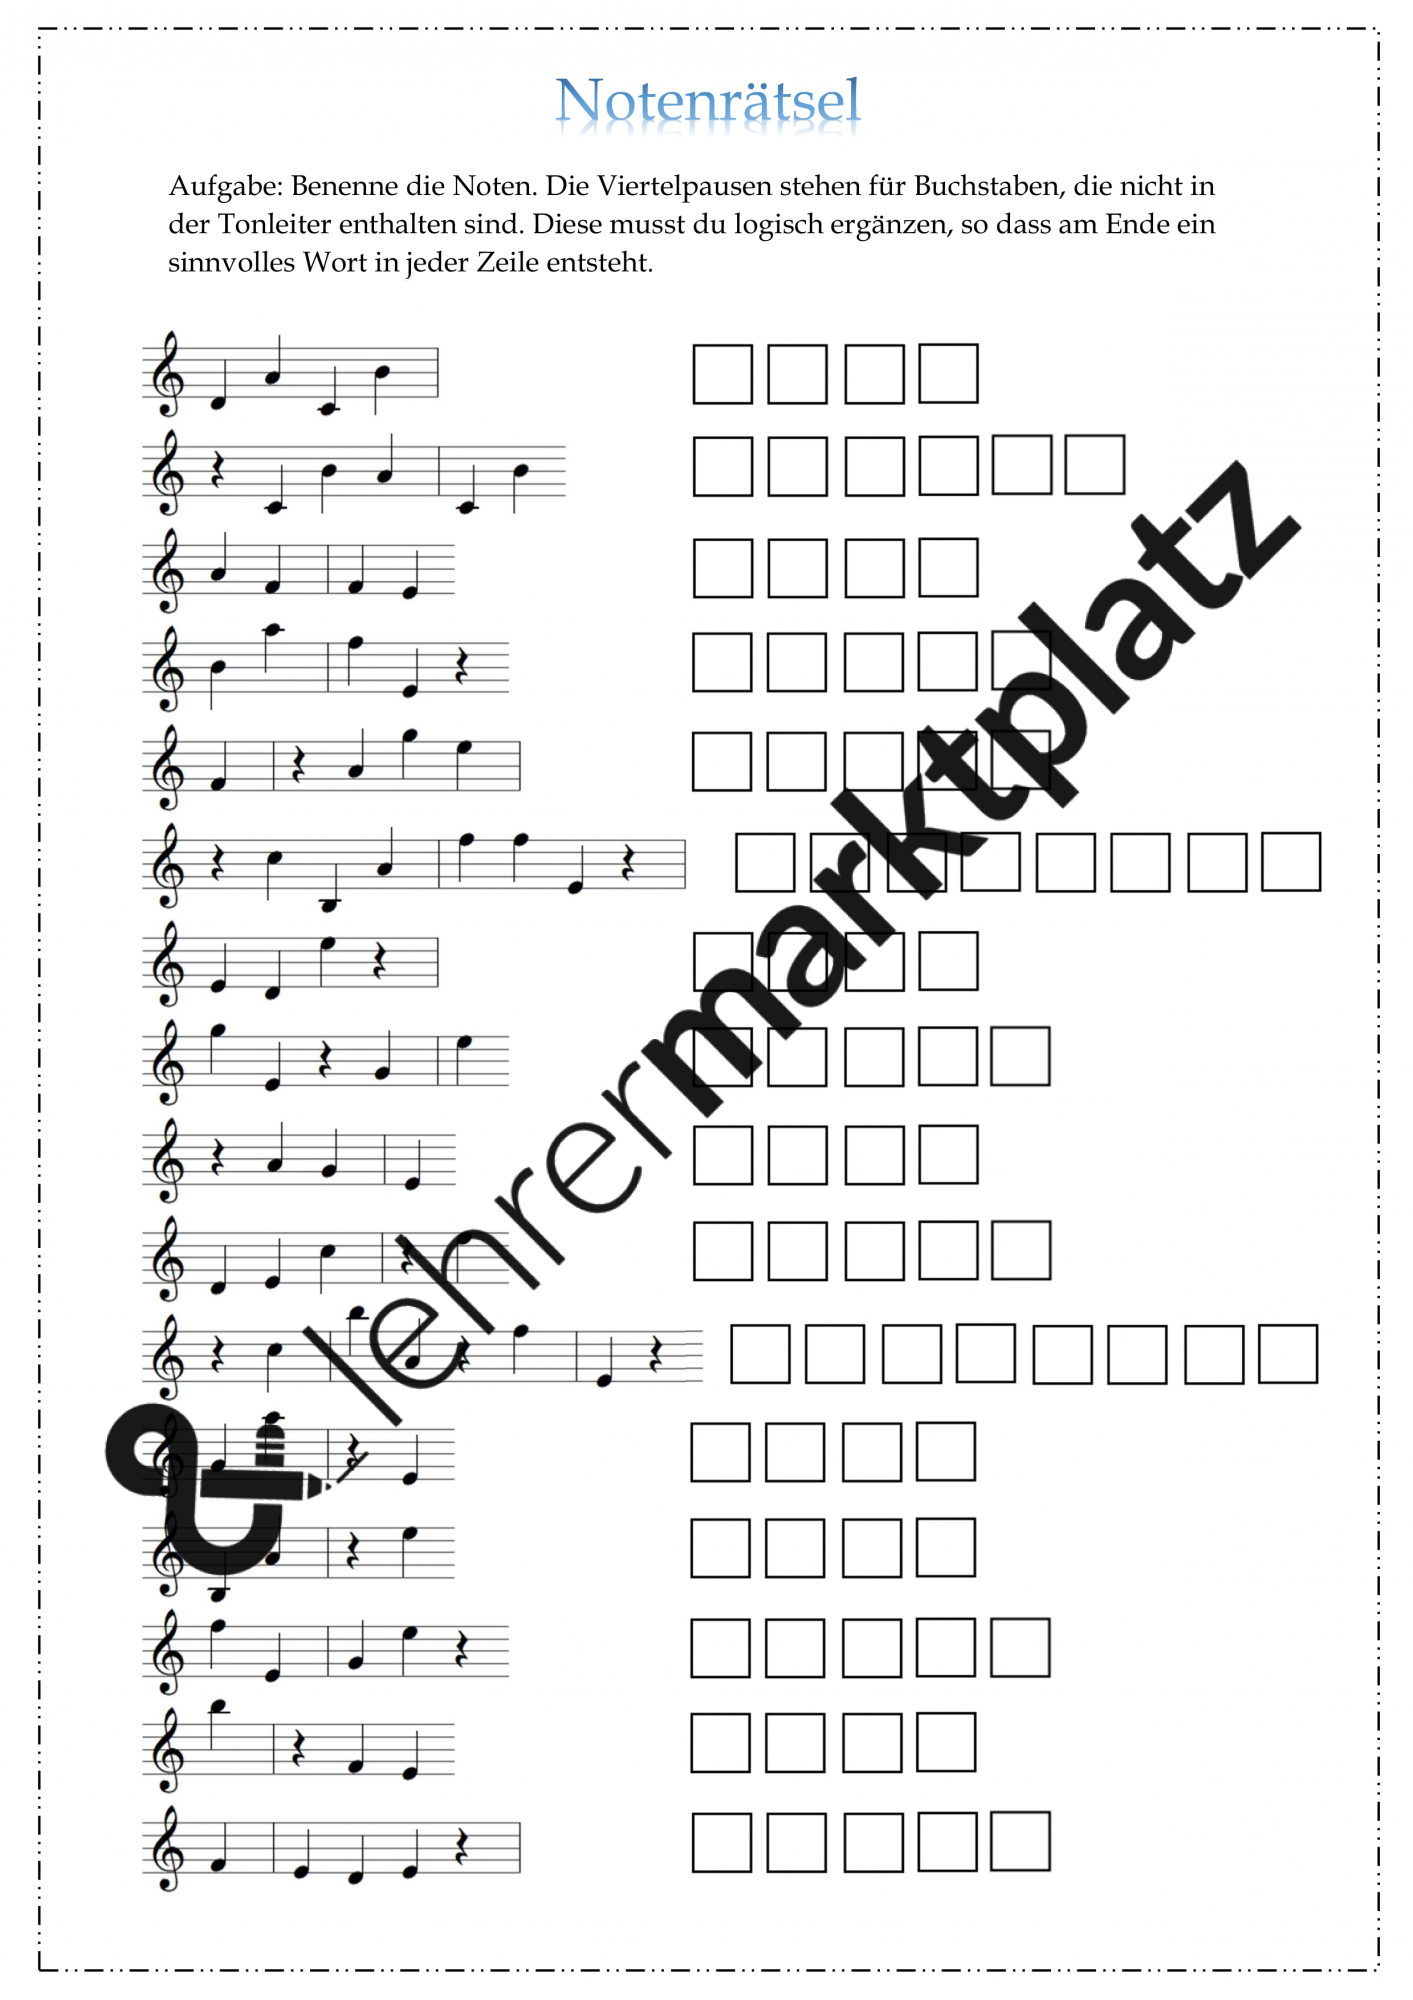 Rätsel für den Musikunterricht 20   Notenrätsel leicht ...